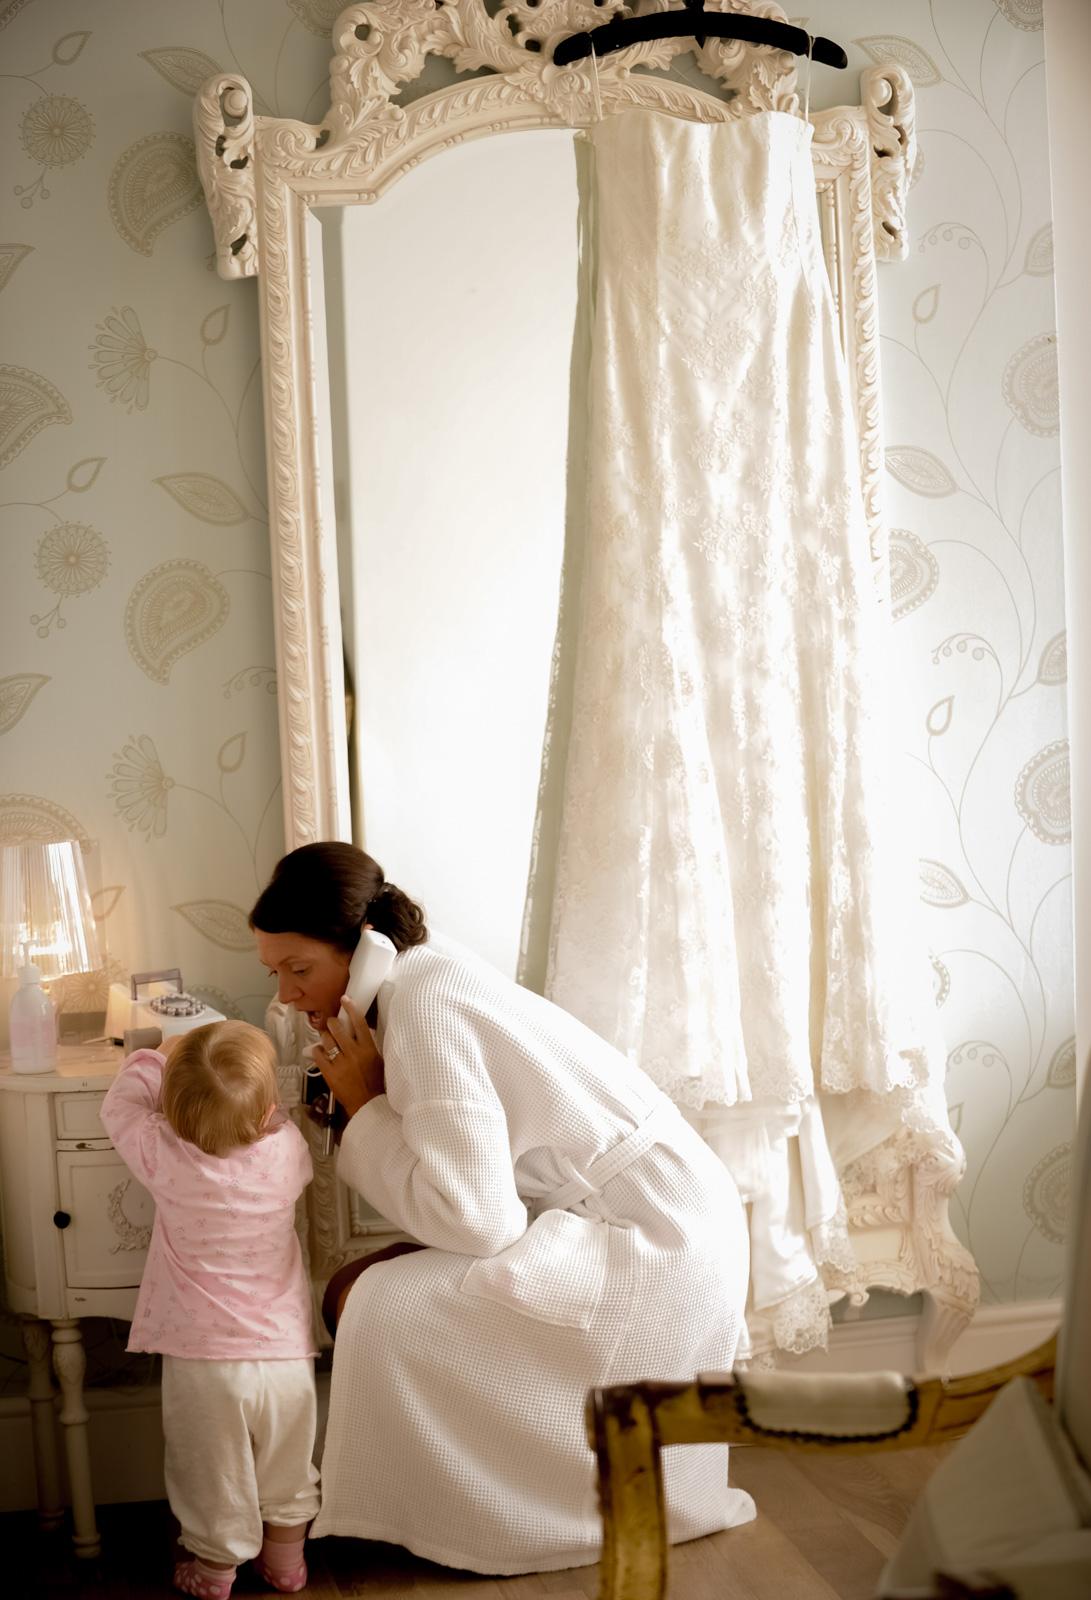 watergate-bay-hotel-wedding-photography-6.jpg